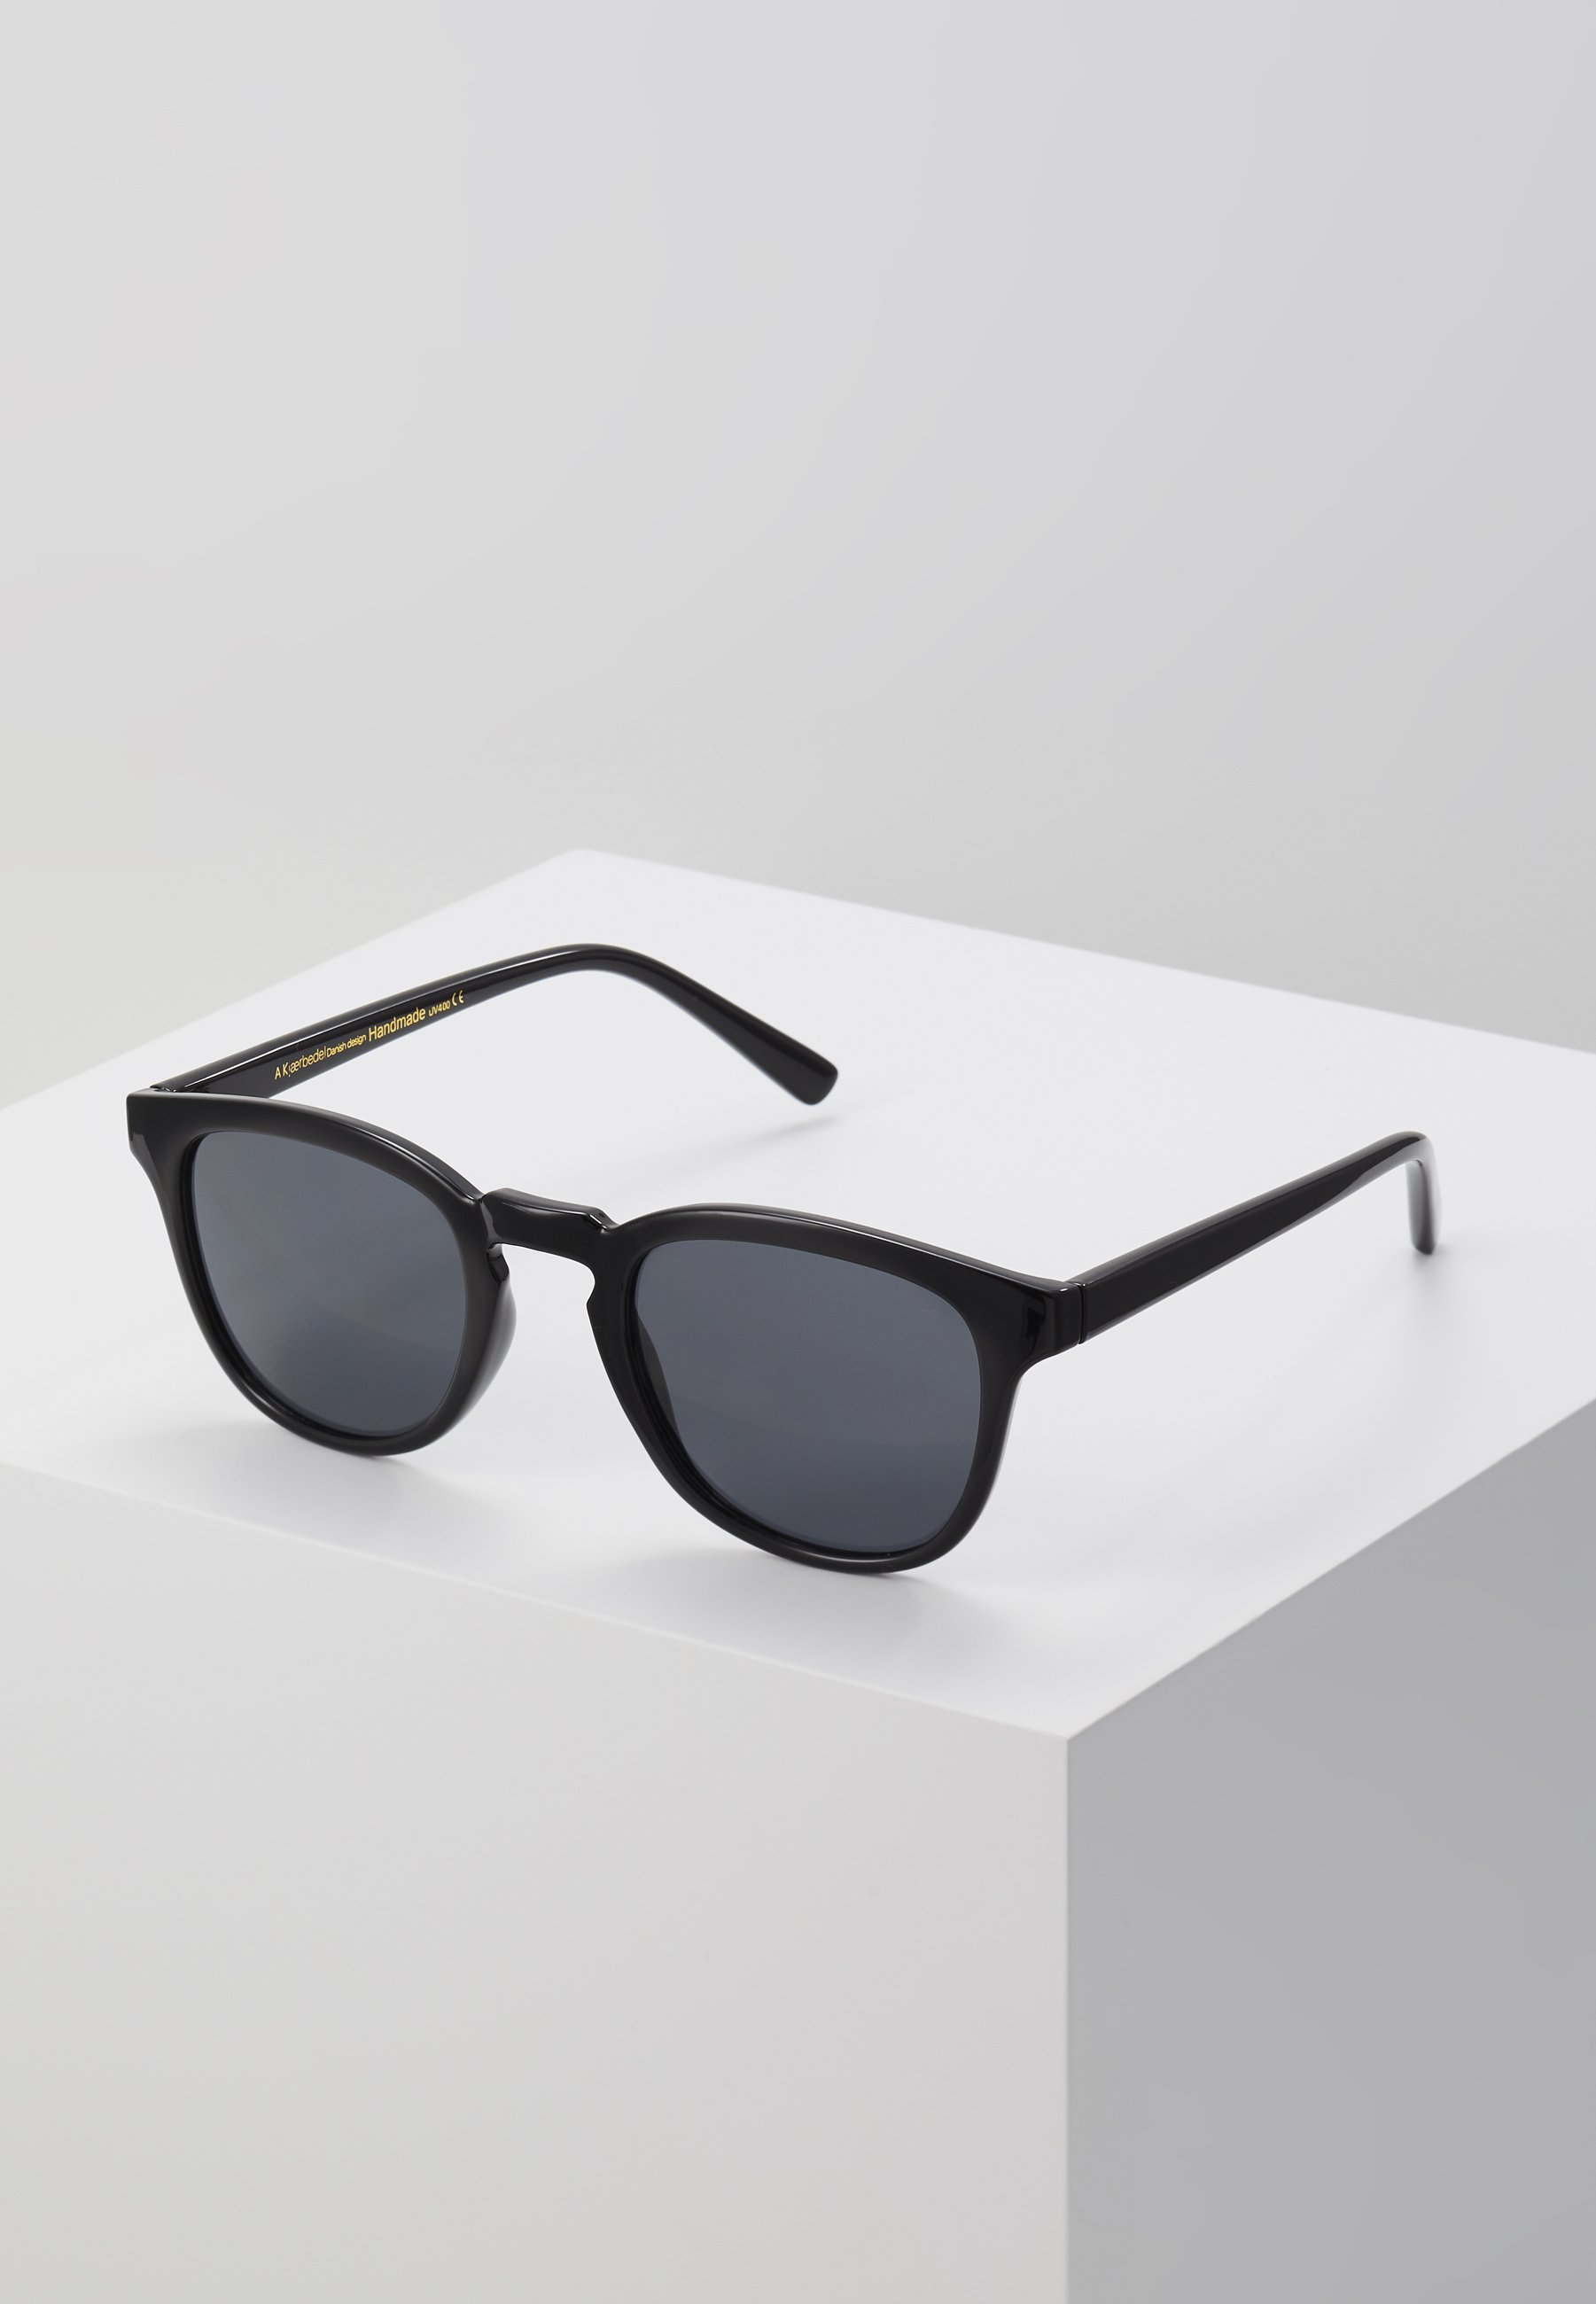 A.Kjærbede BATE - Sunglasses - black